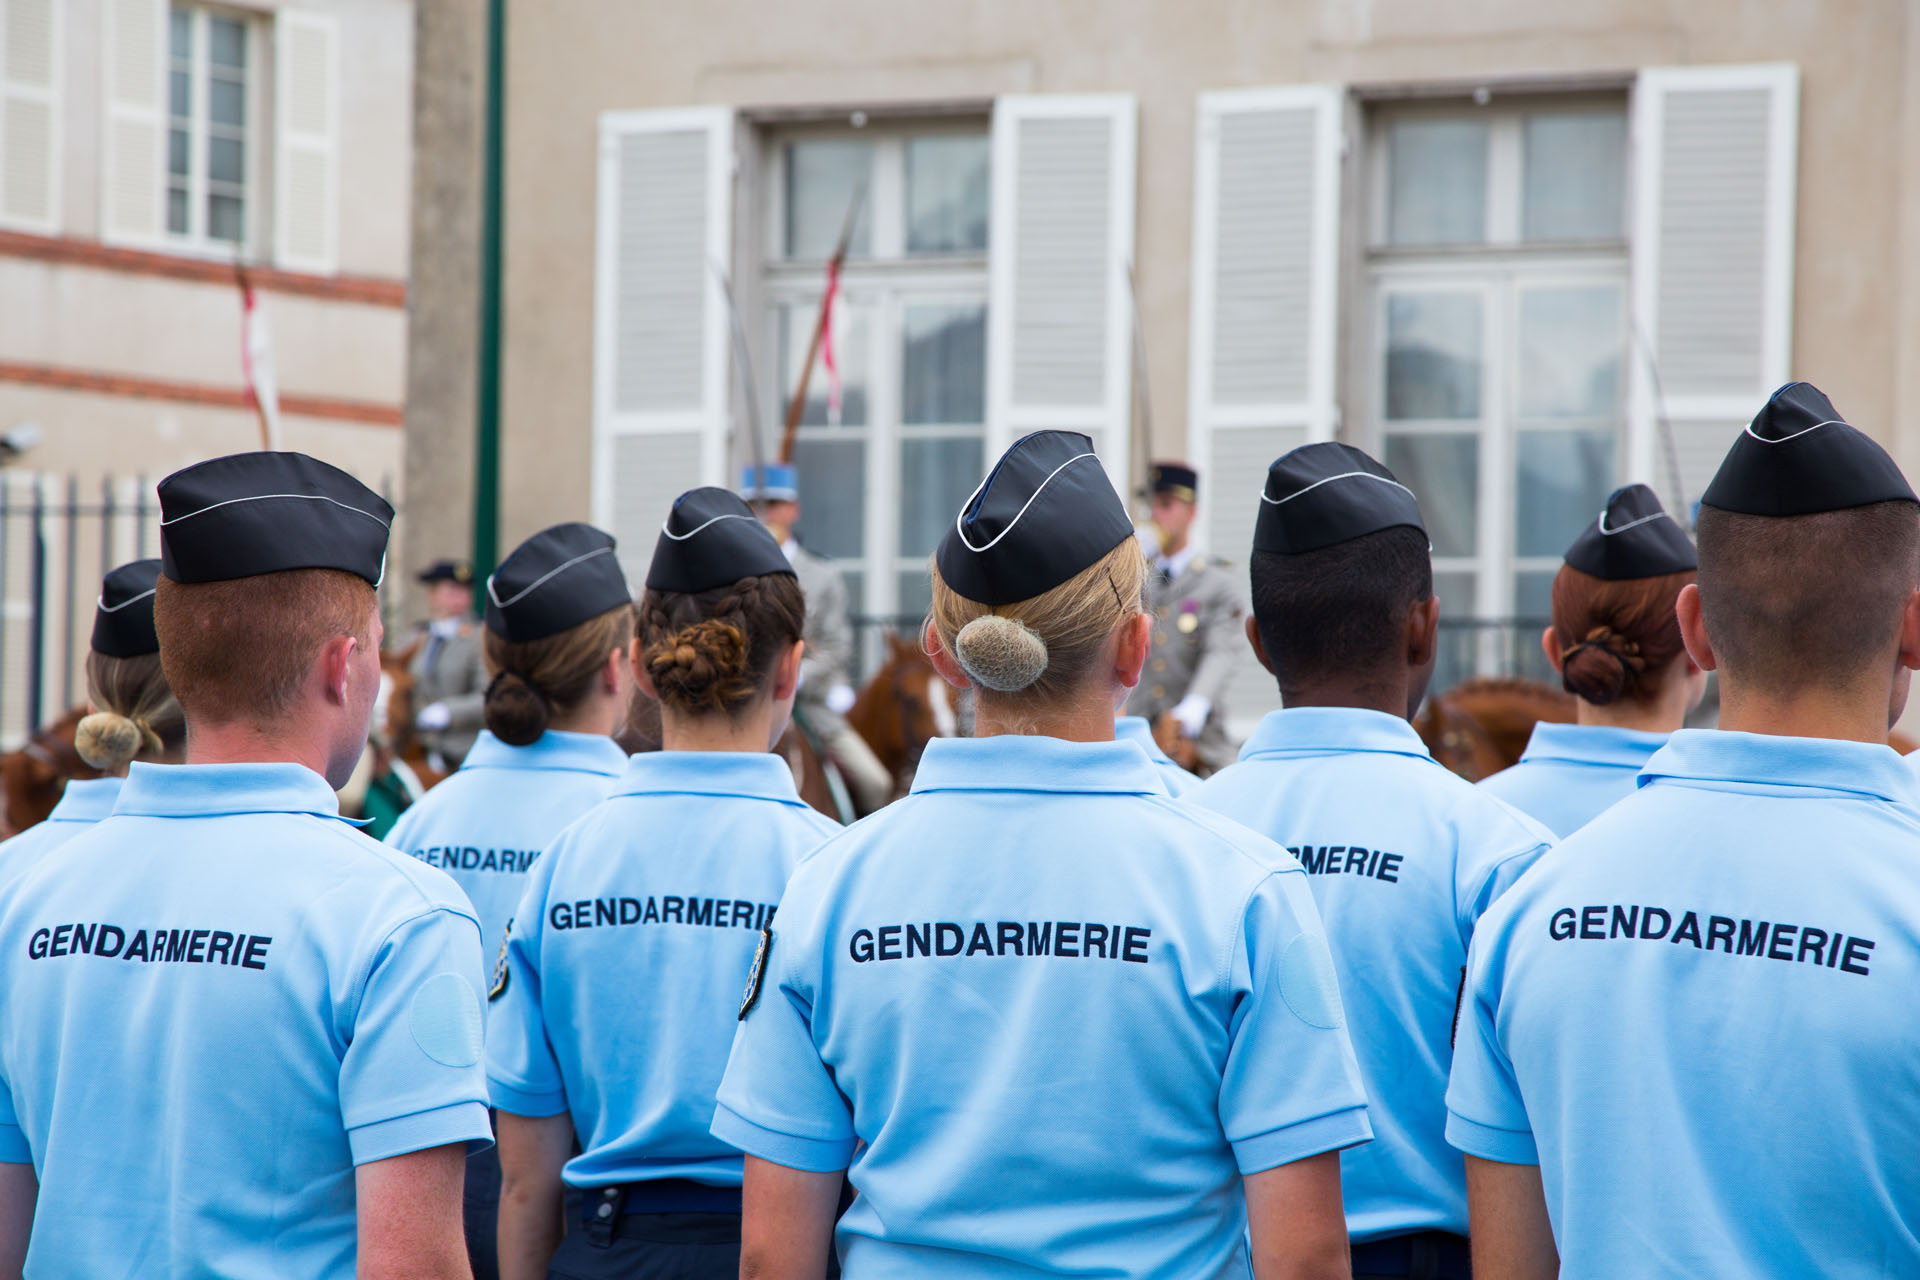 formation gendarmerie